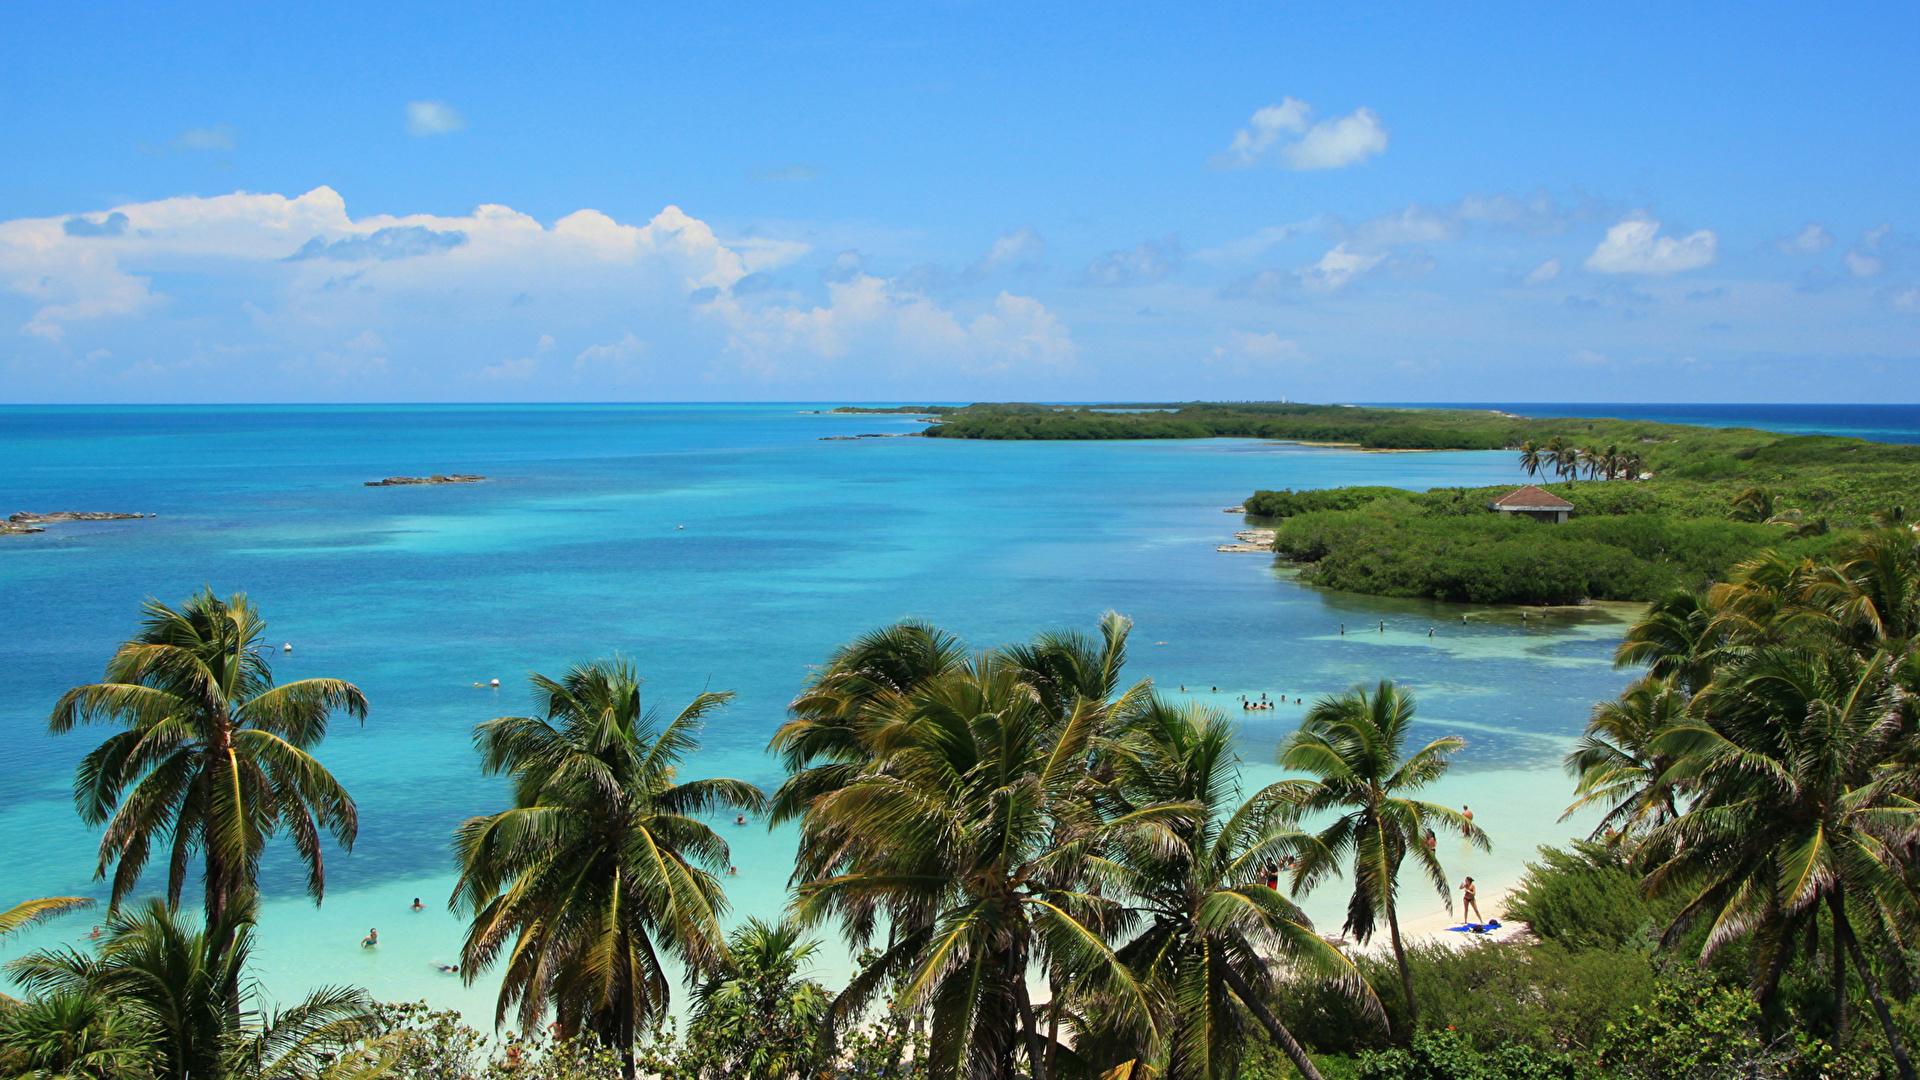 Picture Mexico Cancun Sea Nature Palm Trees Coast 1920x1080